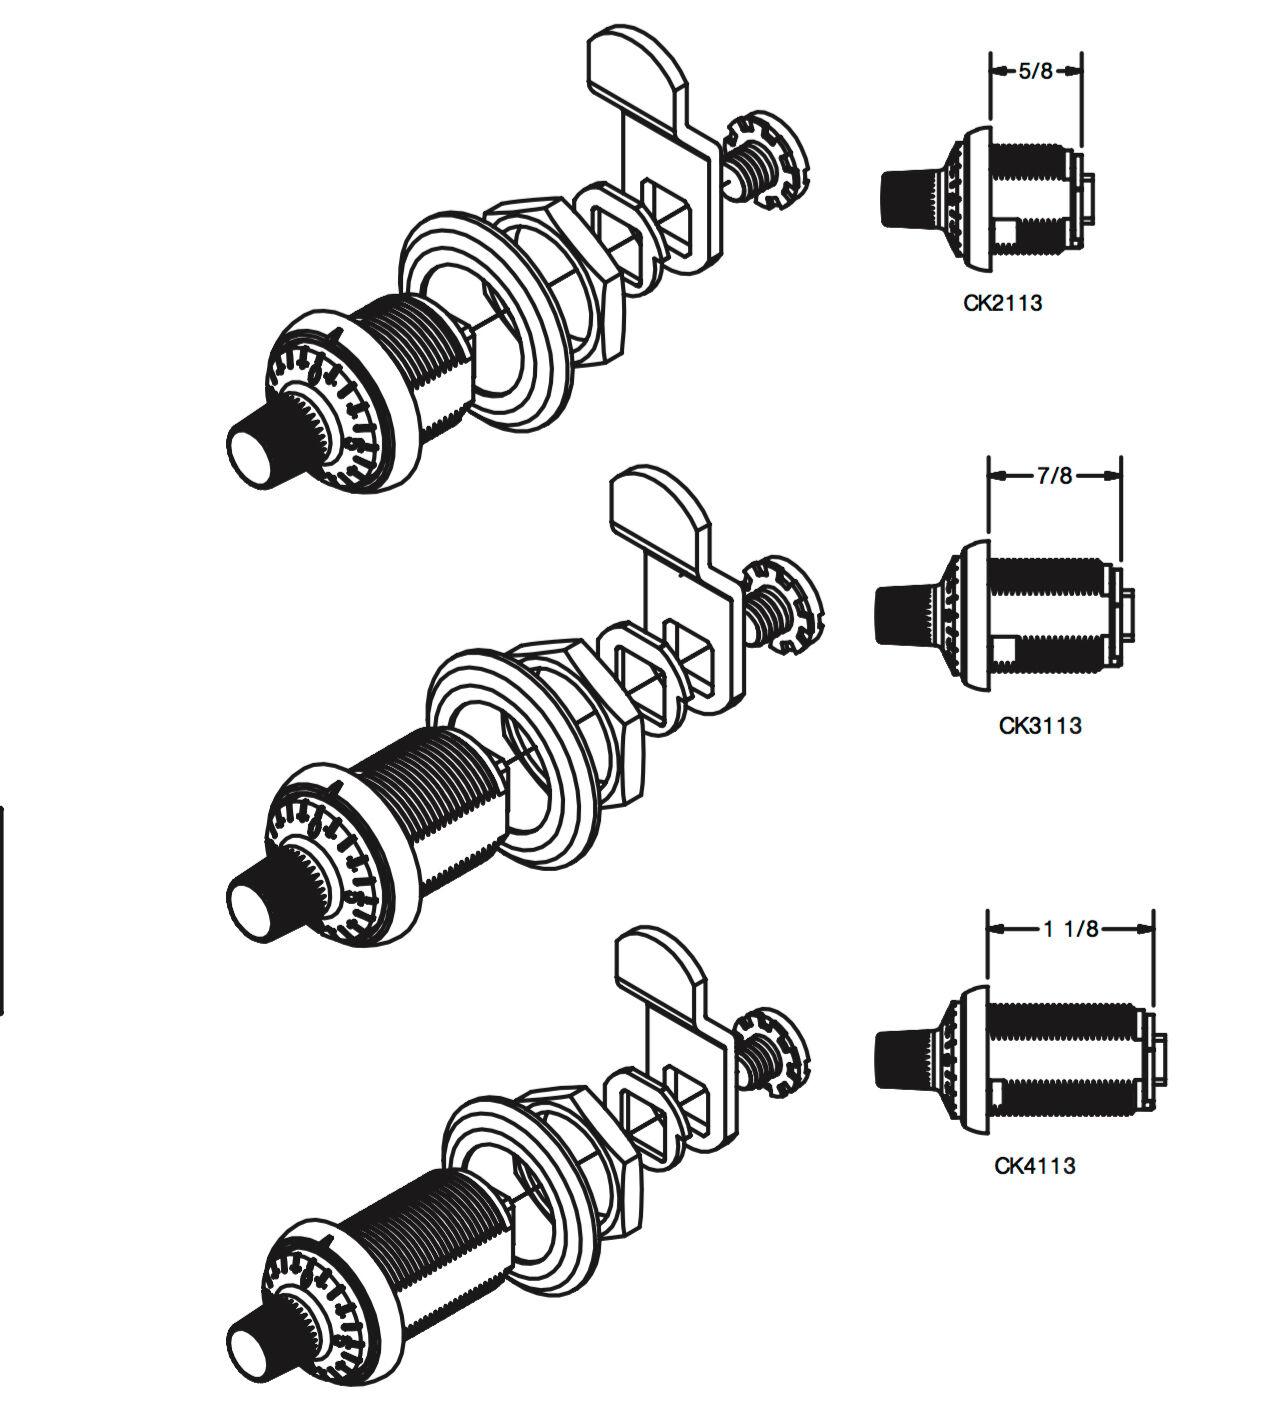 Combination Rotary Dial Digital Cam lock Post Box Lockers Furniture Cabinet